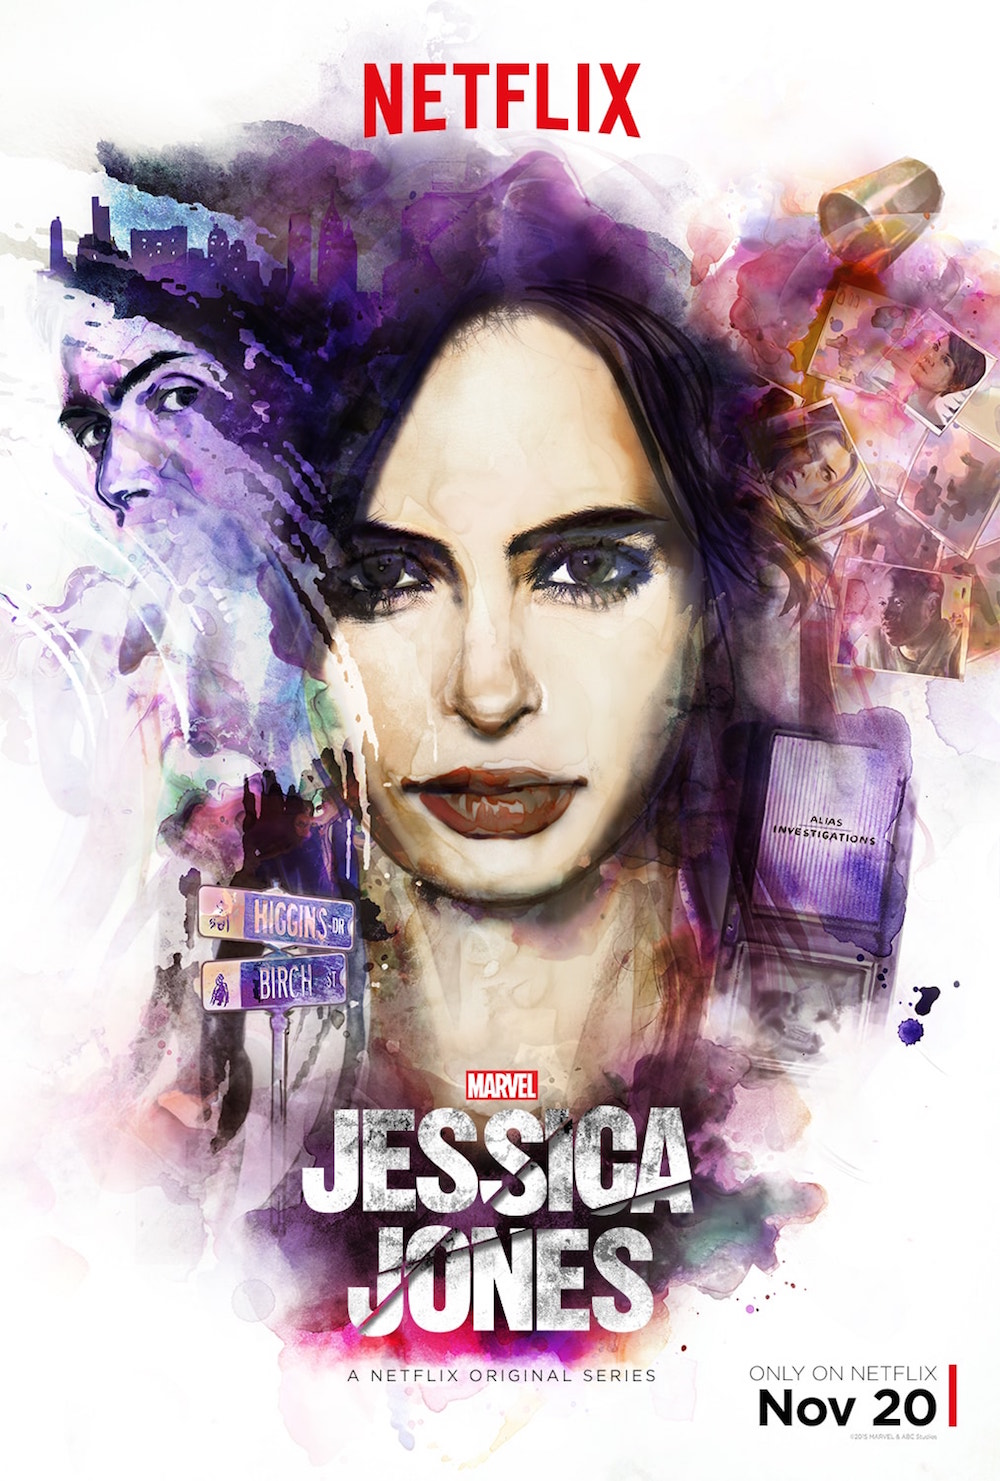 Marvels-Jessica-Jones-poster-min.jpg